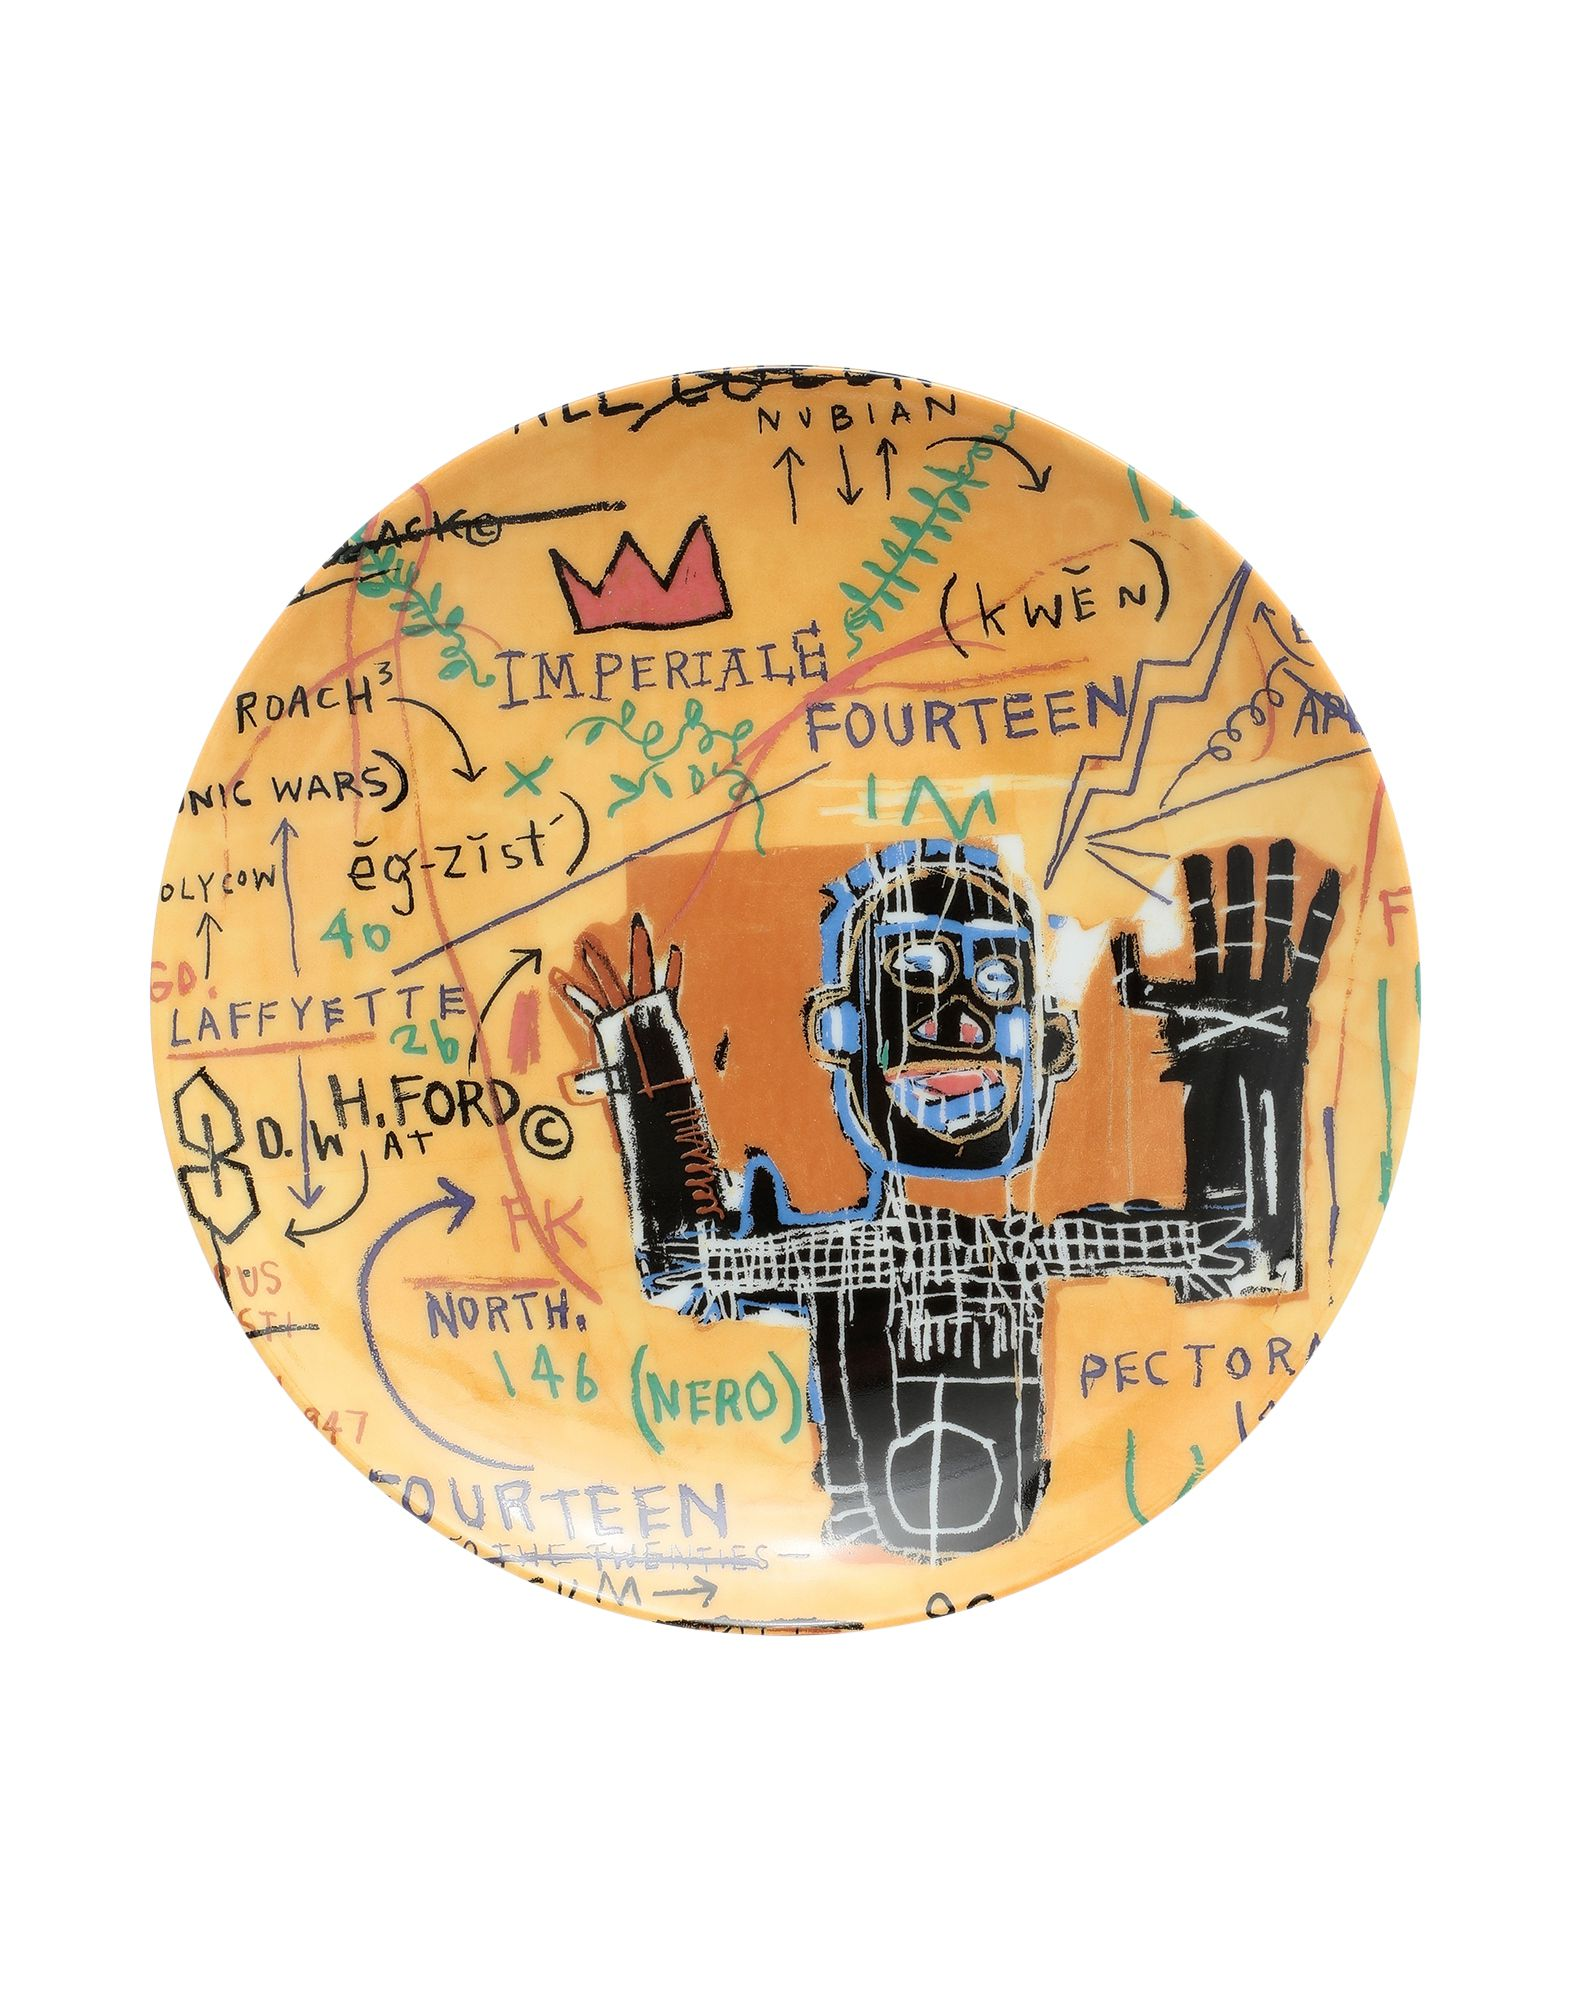 LIGNE BLANCHE Декоративная тарелка чарльз фрейс изучает новый мир декоративная тарелка фарфор деколь золочение hamilton collection сша 1989 год